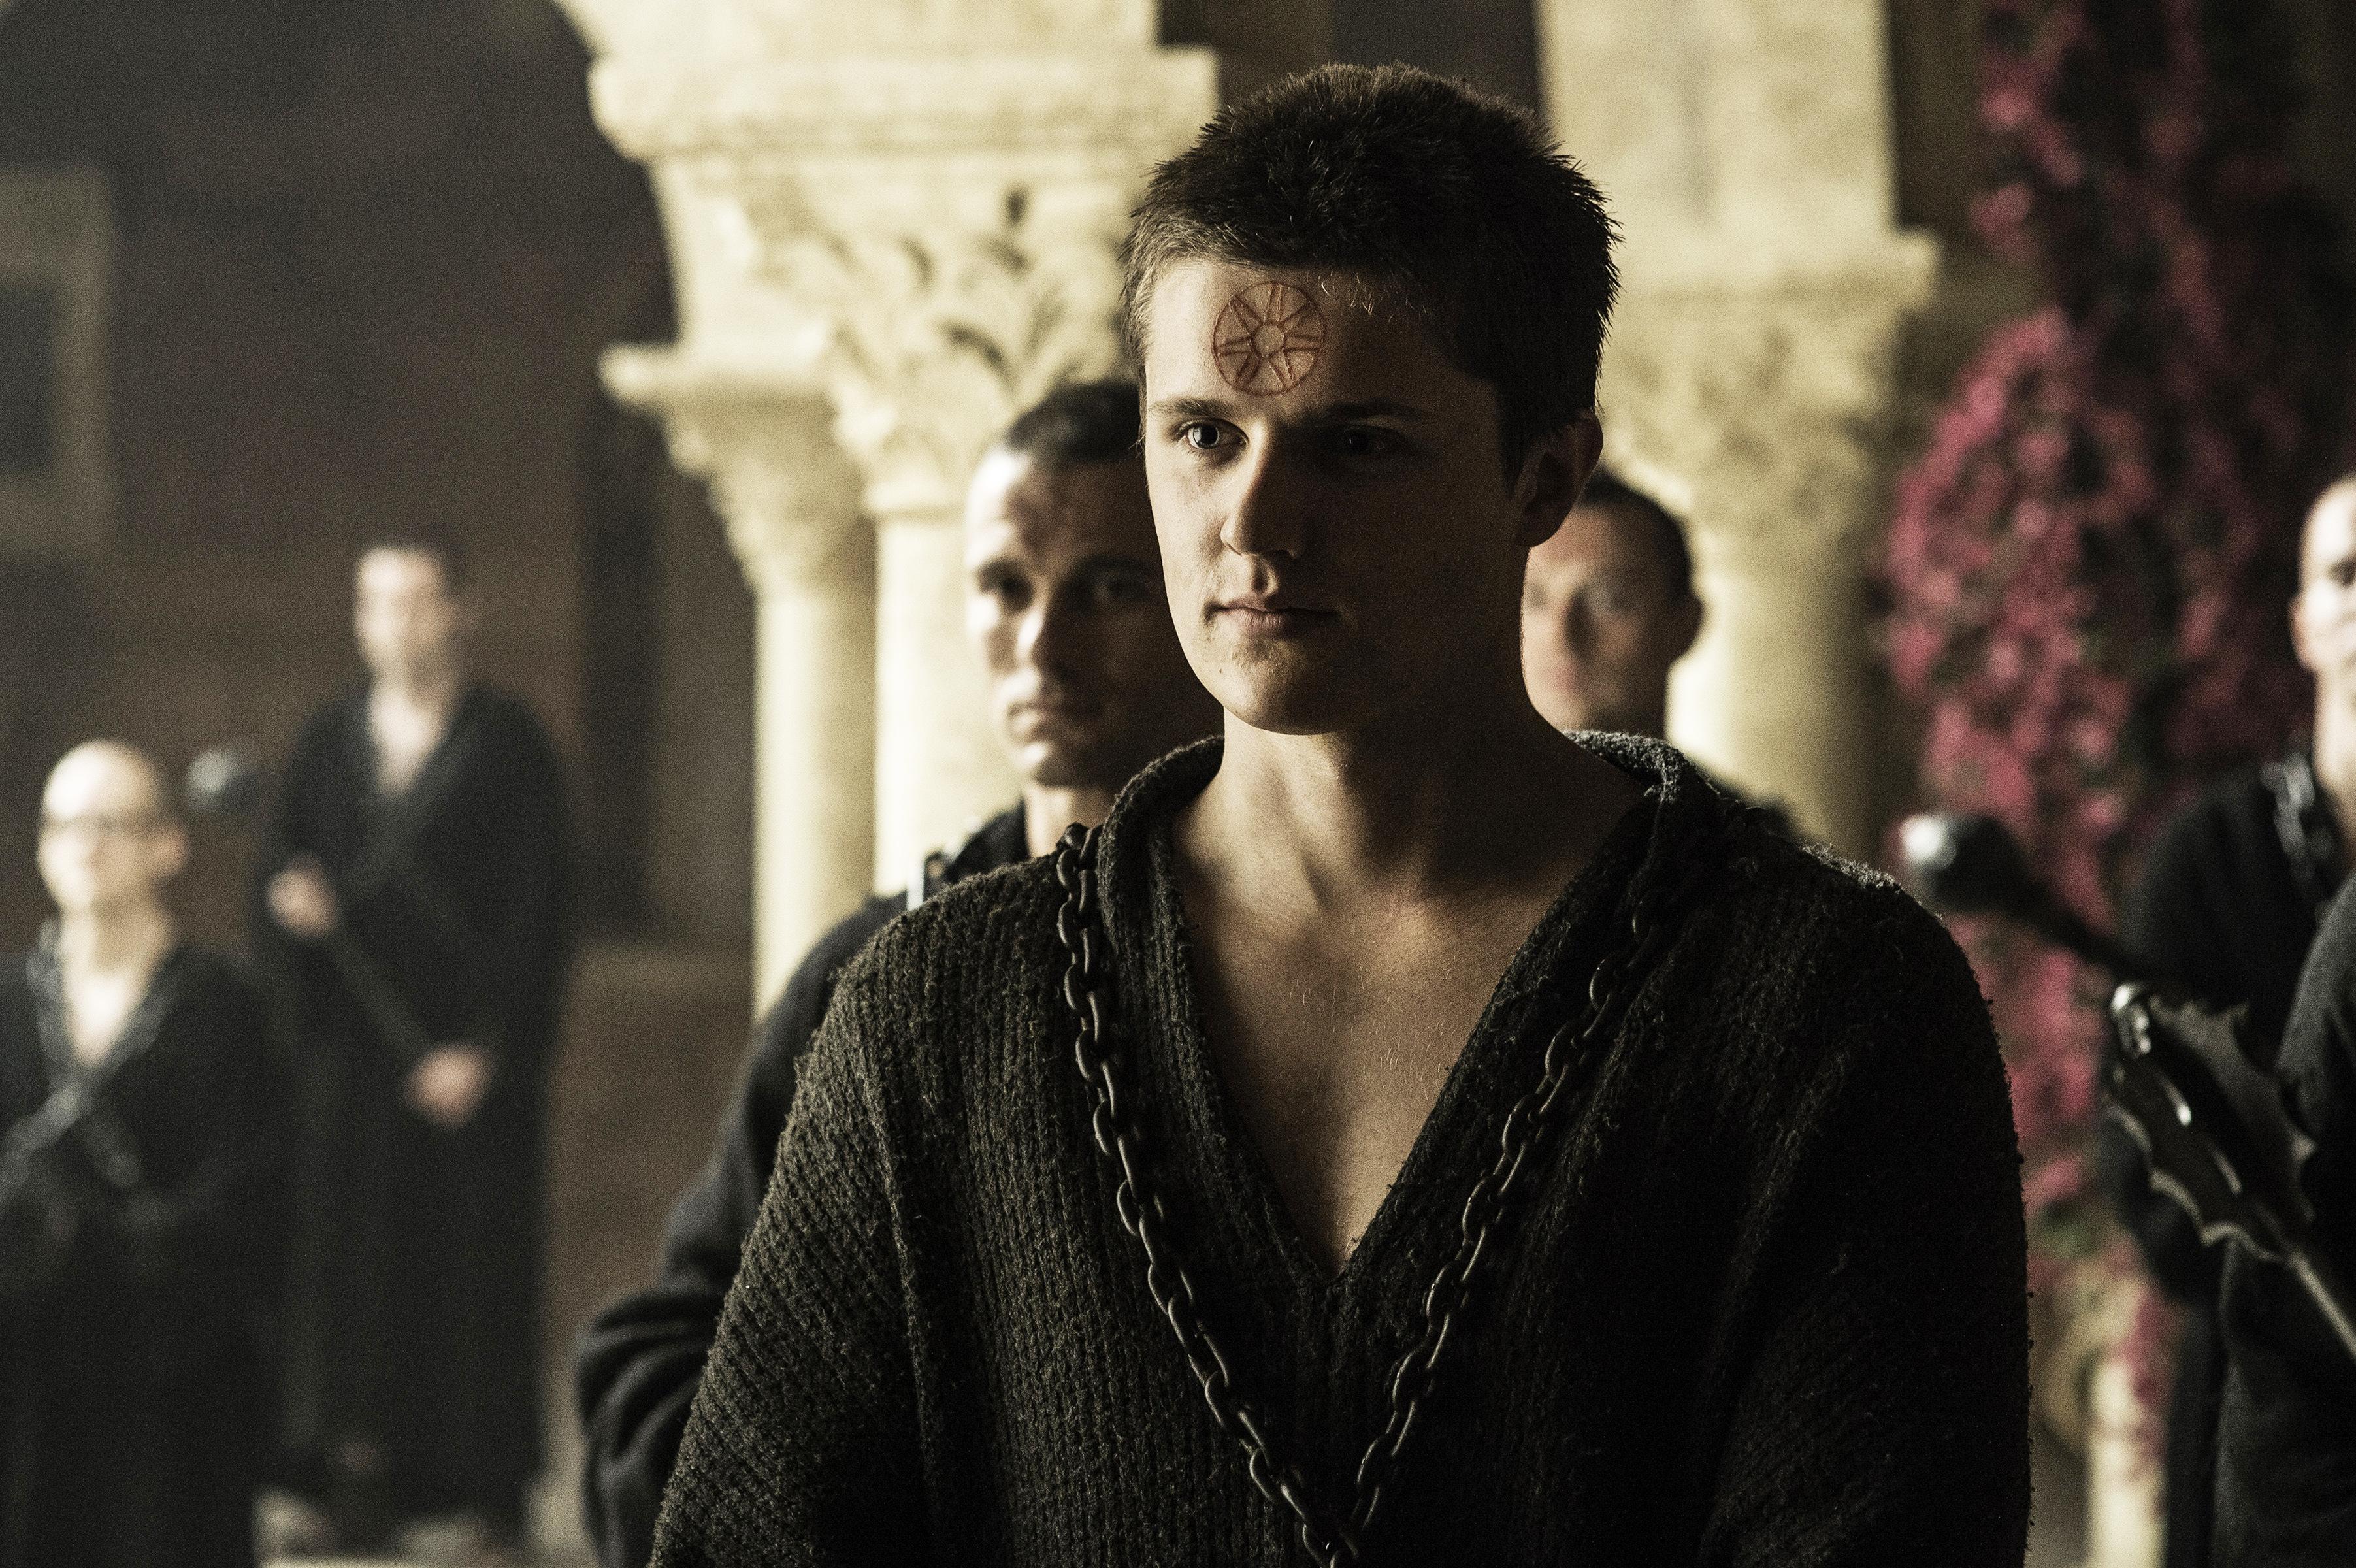 Eugene Simon in Game of Thrones, season 6, episode 8.